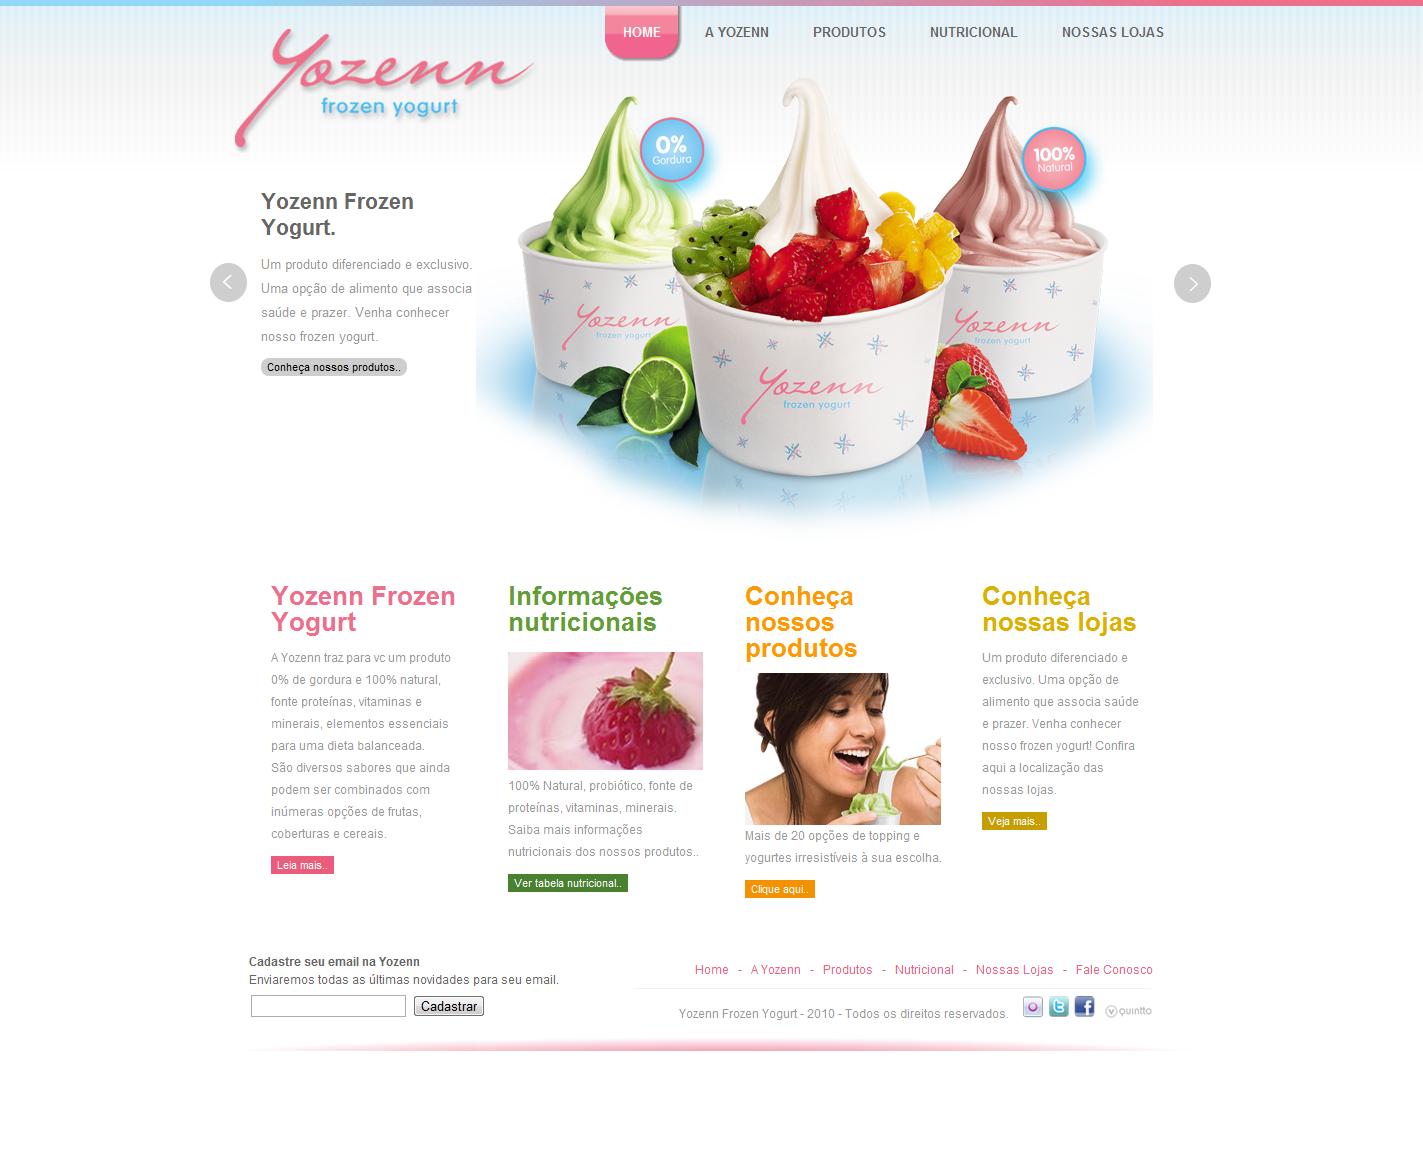 Inspiraci n para p ginas web inspiraci n dise o web heladeria - Diseno de interiores heladerias ...